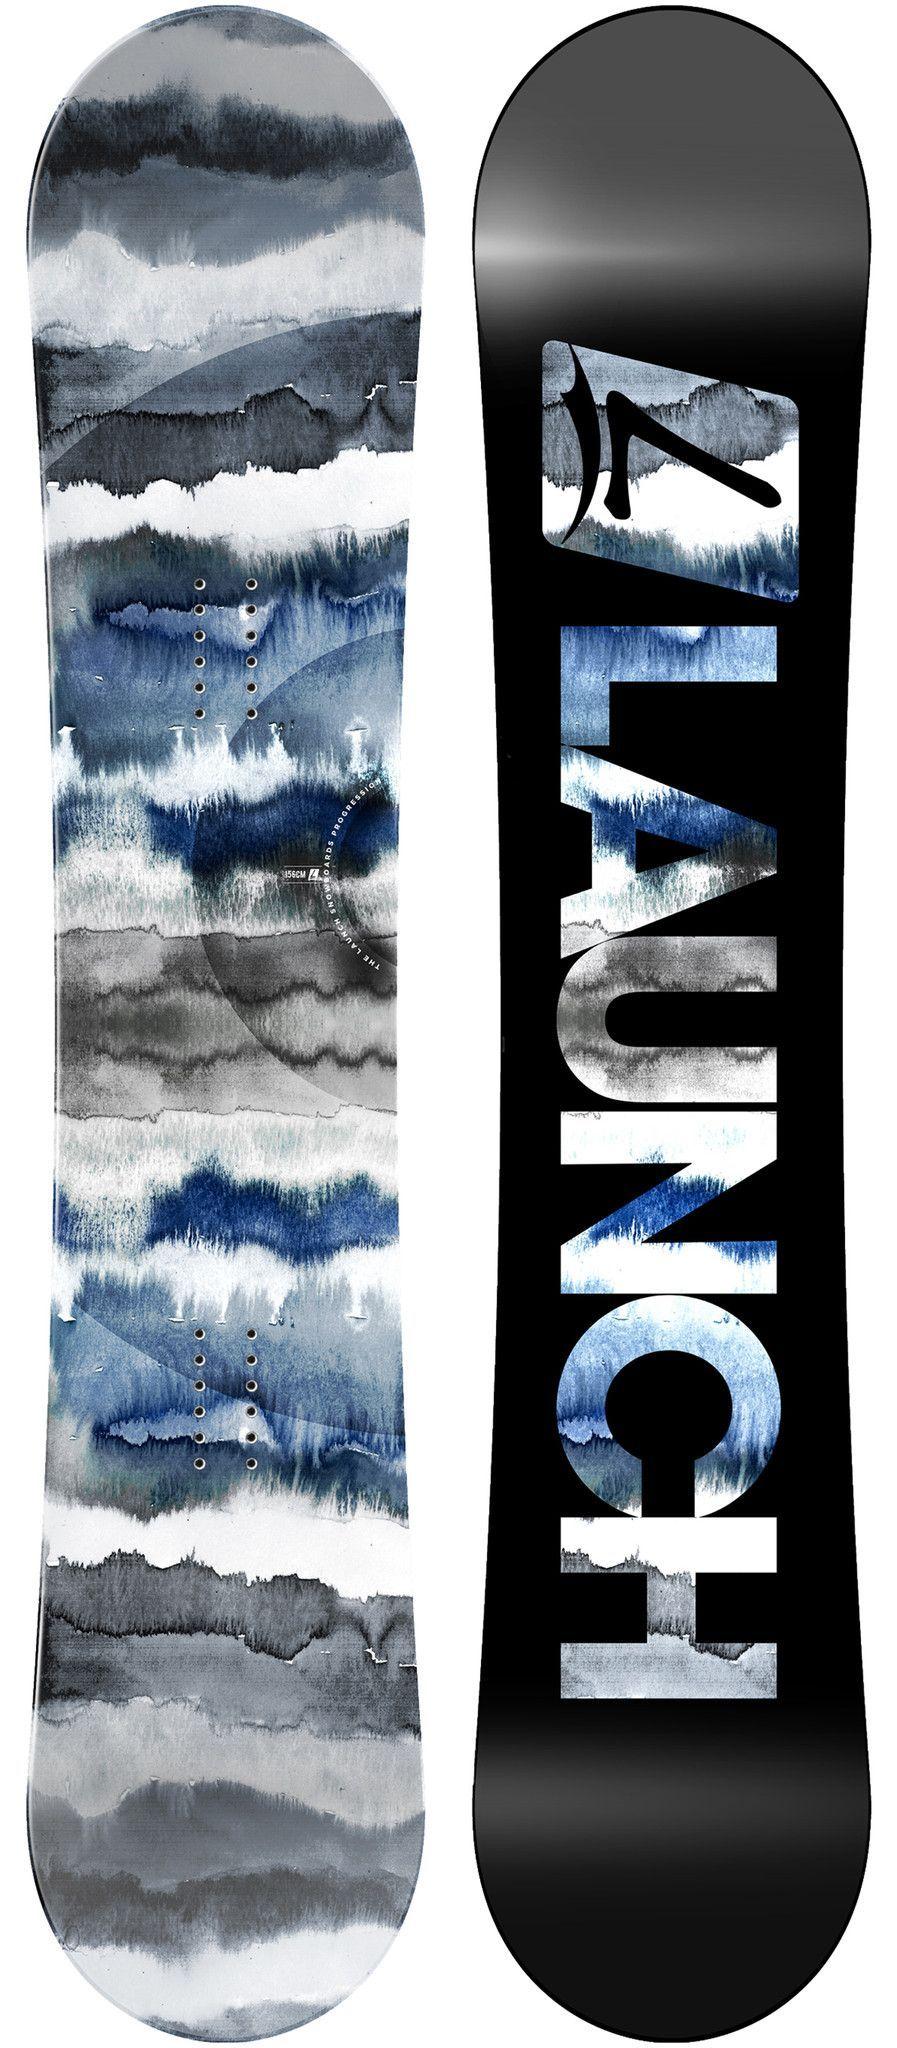 2016 Launch Men S Progression Snowboard Snowboard Snow Skiing Snowboard Design